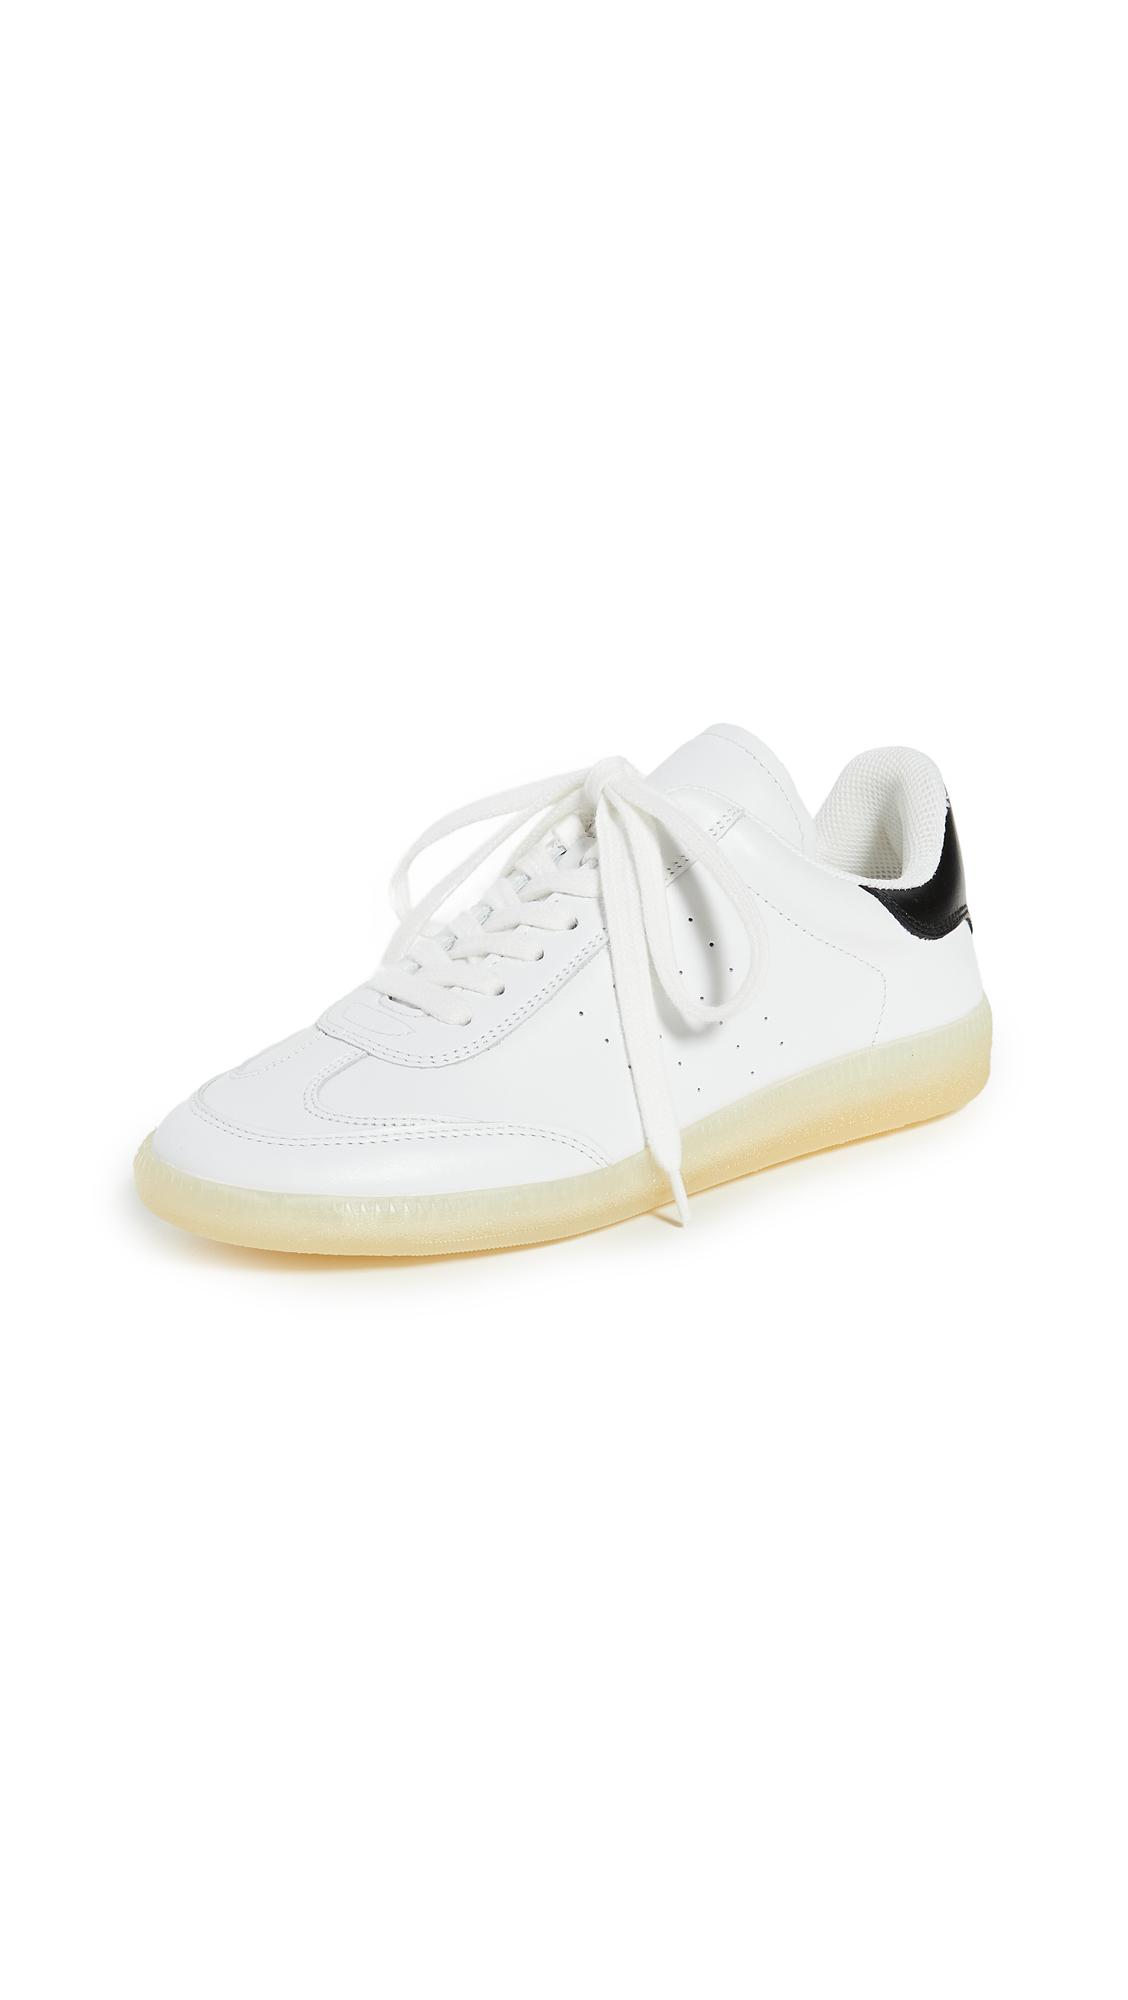 Buy Isabel Marant Bryvee Sneakers online, shop Isabel Marant